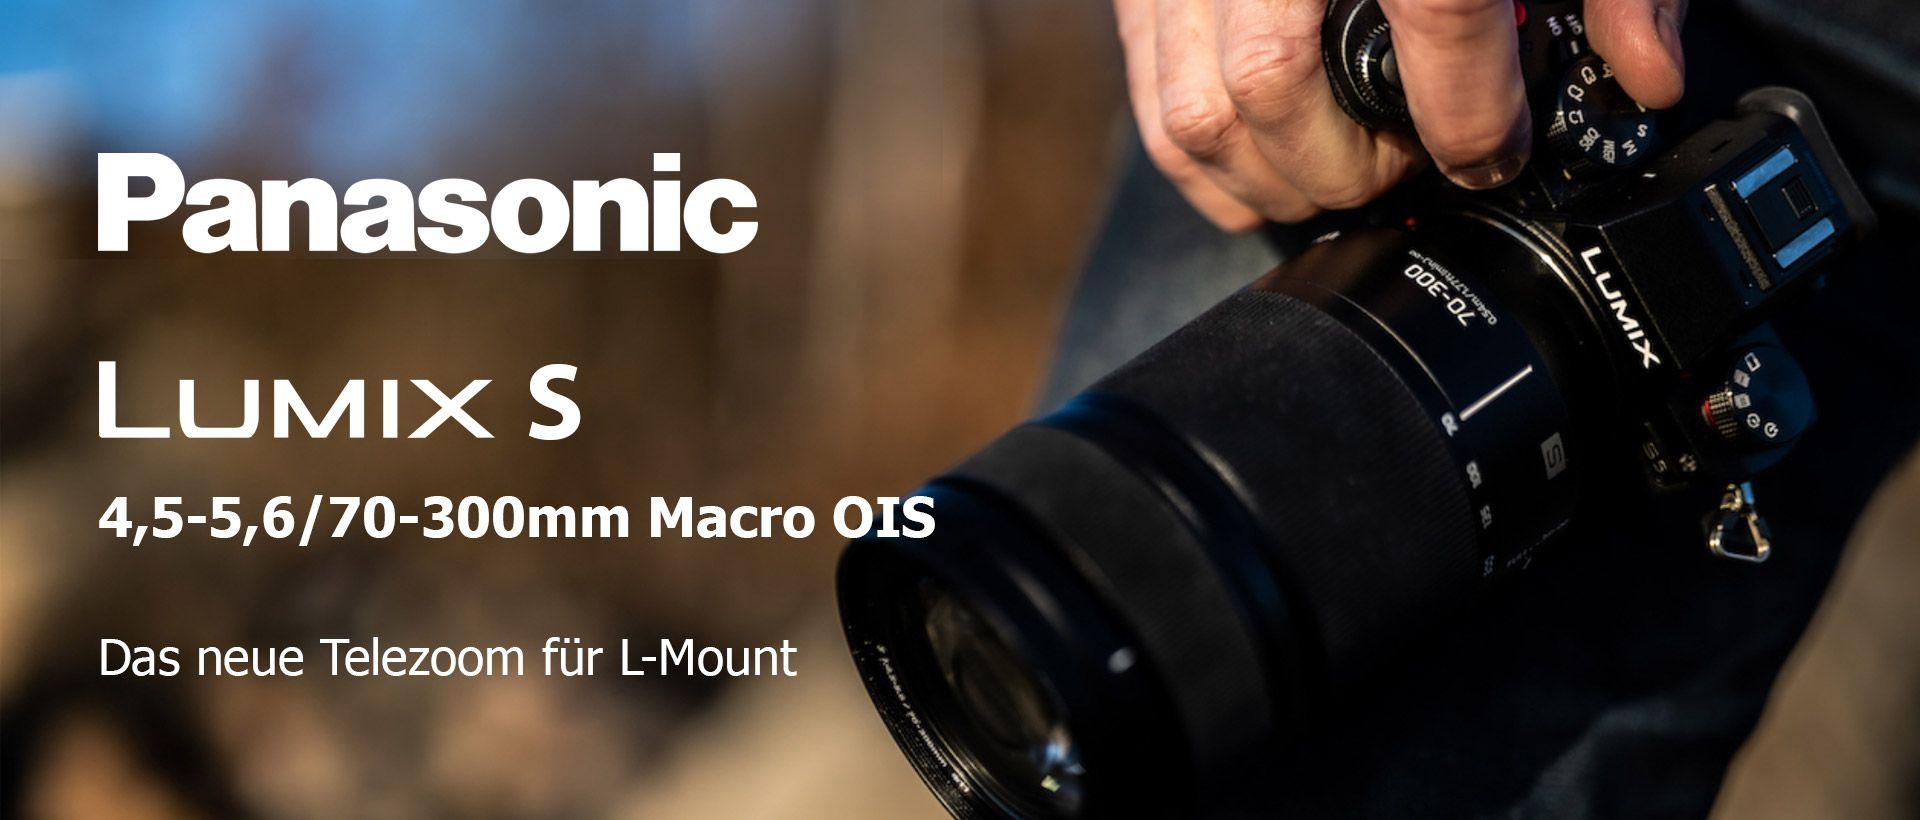 Panasonic Lumix S 4,5-5,6/70-300mm Macro OIS